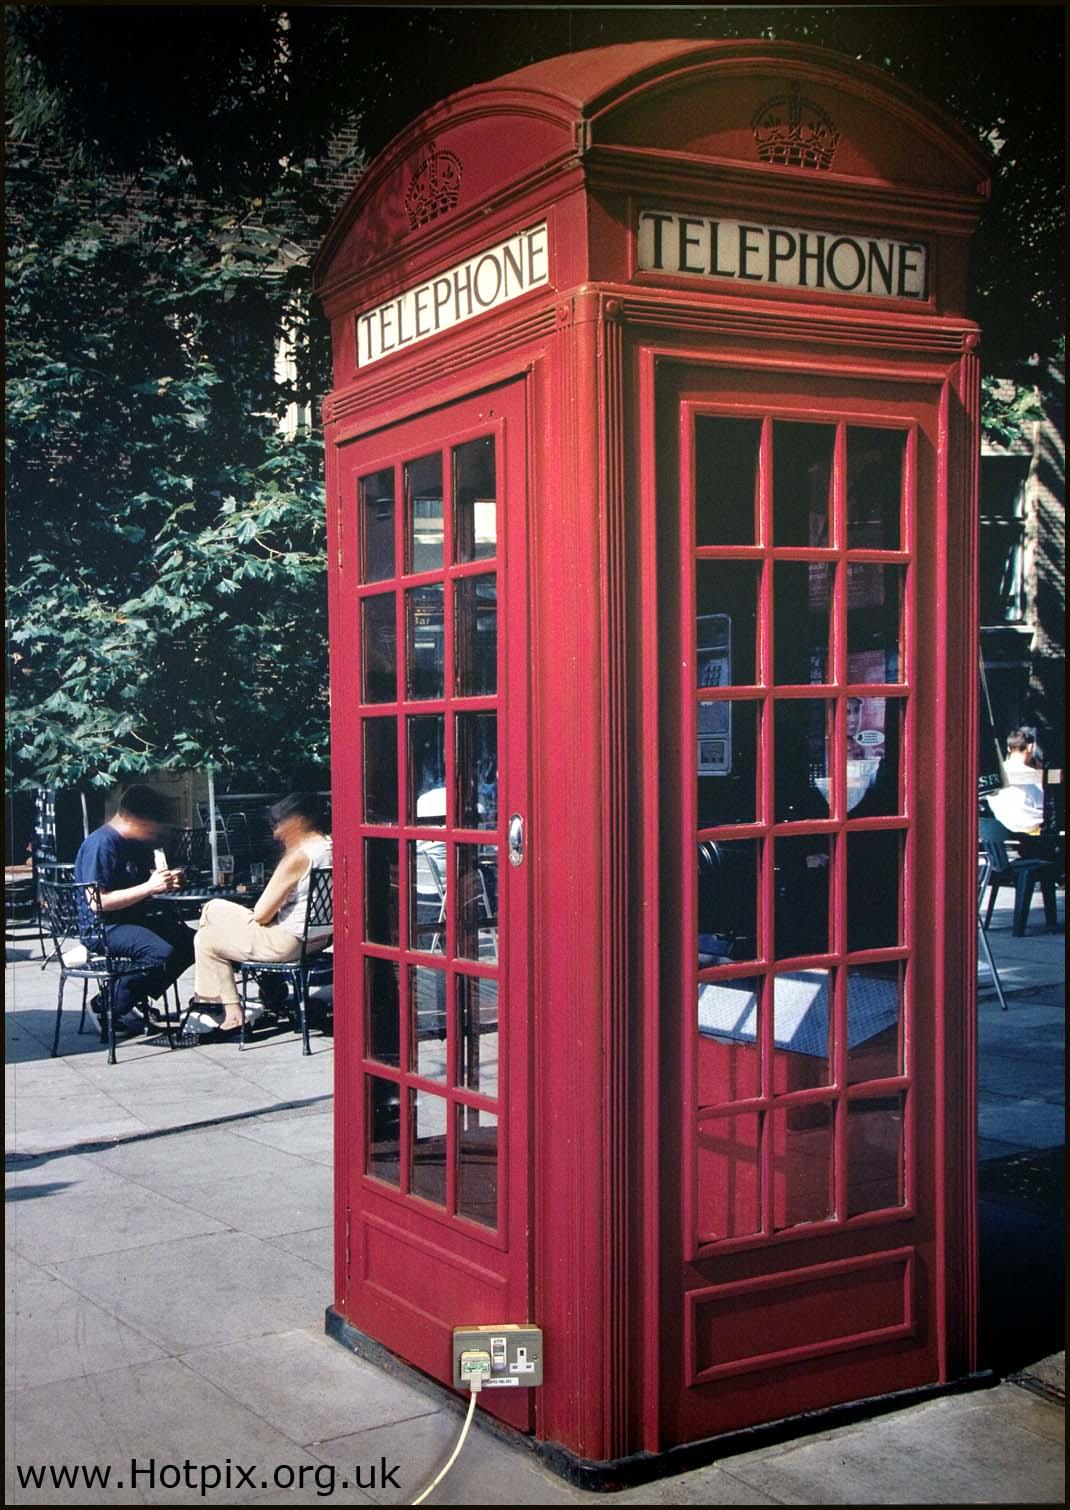 red,telephone,gpo,box,K6,13amp,plug,glasgow,airport,icon,iconic red,iconic,british,britain,empire,famous,tourist,sights,london,13,amp,socket,surreal,hotpics,hotpic,hotpick,hotpicks,abstract,narrative,sex,sexy,hotpix!,#tonysmith,#tonysmithhotpix,#hotpixuk,phone,phonebox